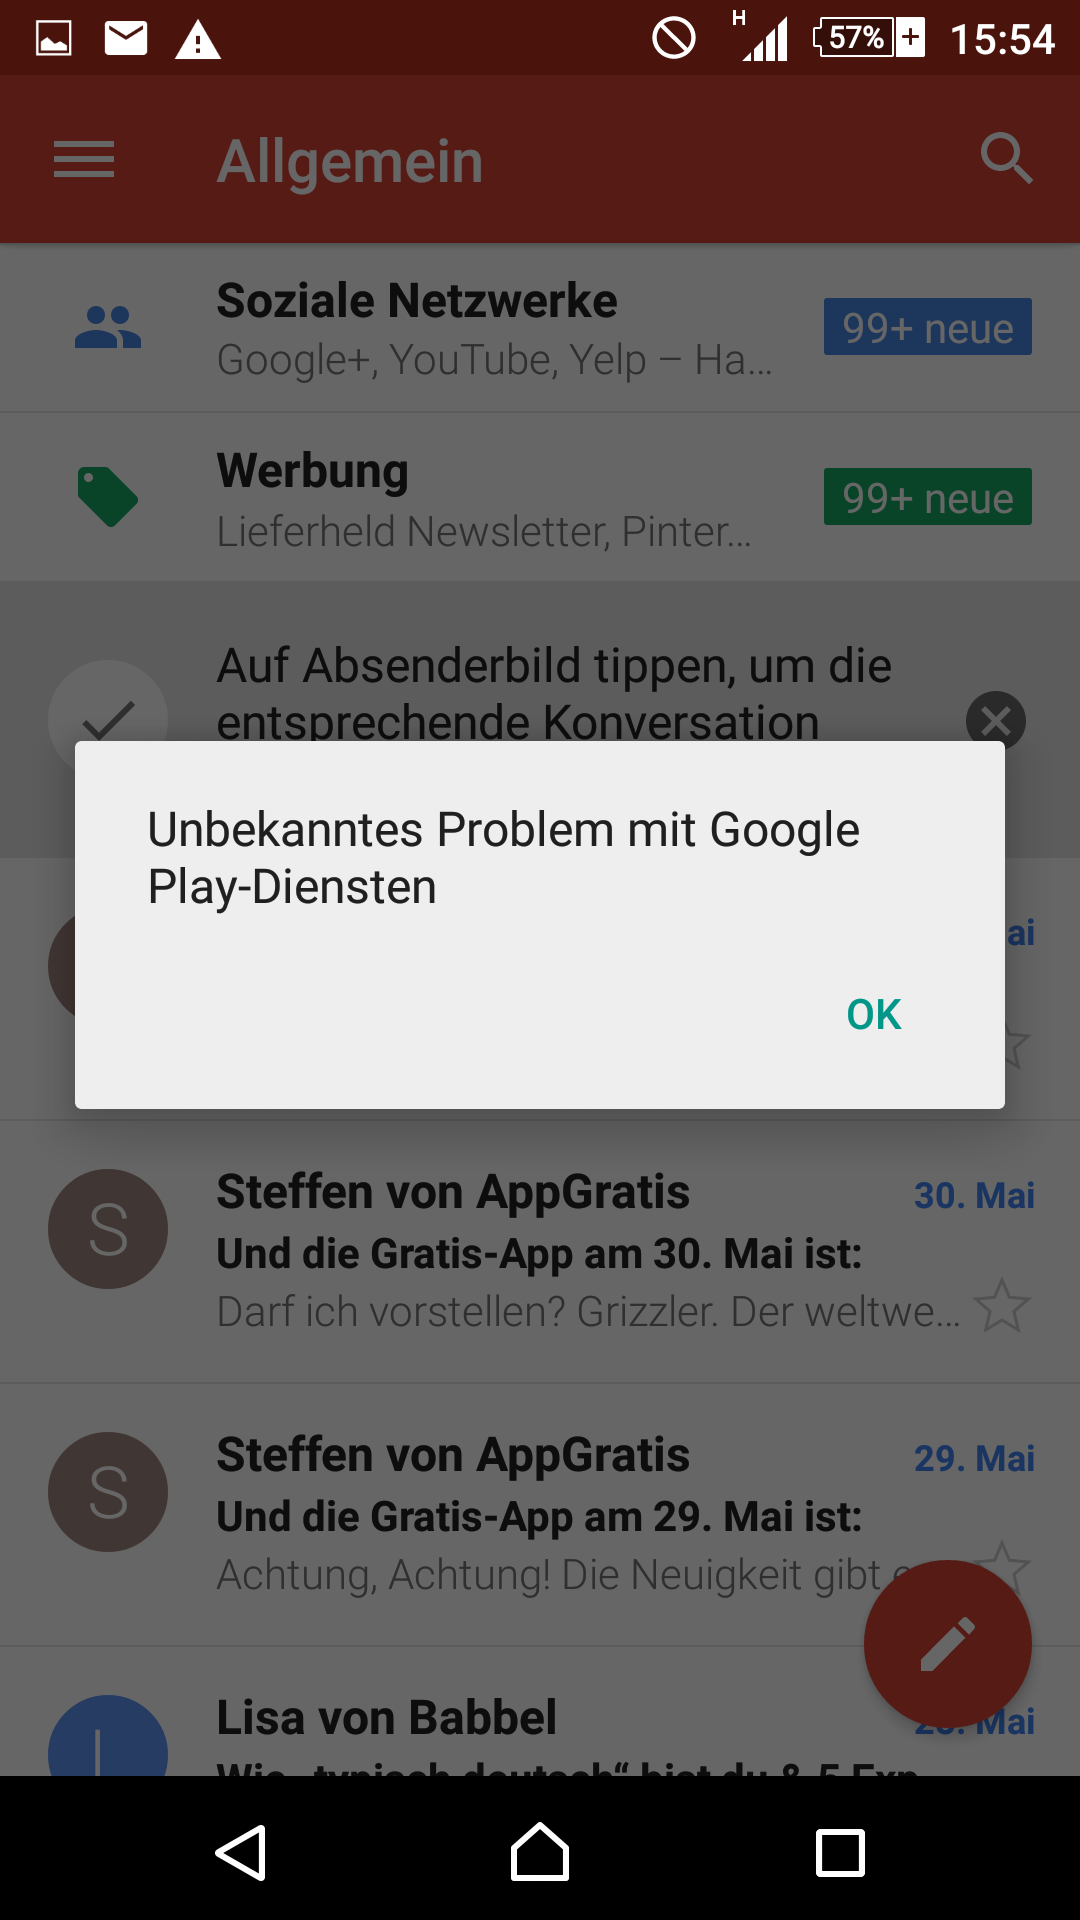 Google App Wird Wiederholt Beendet